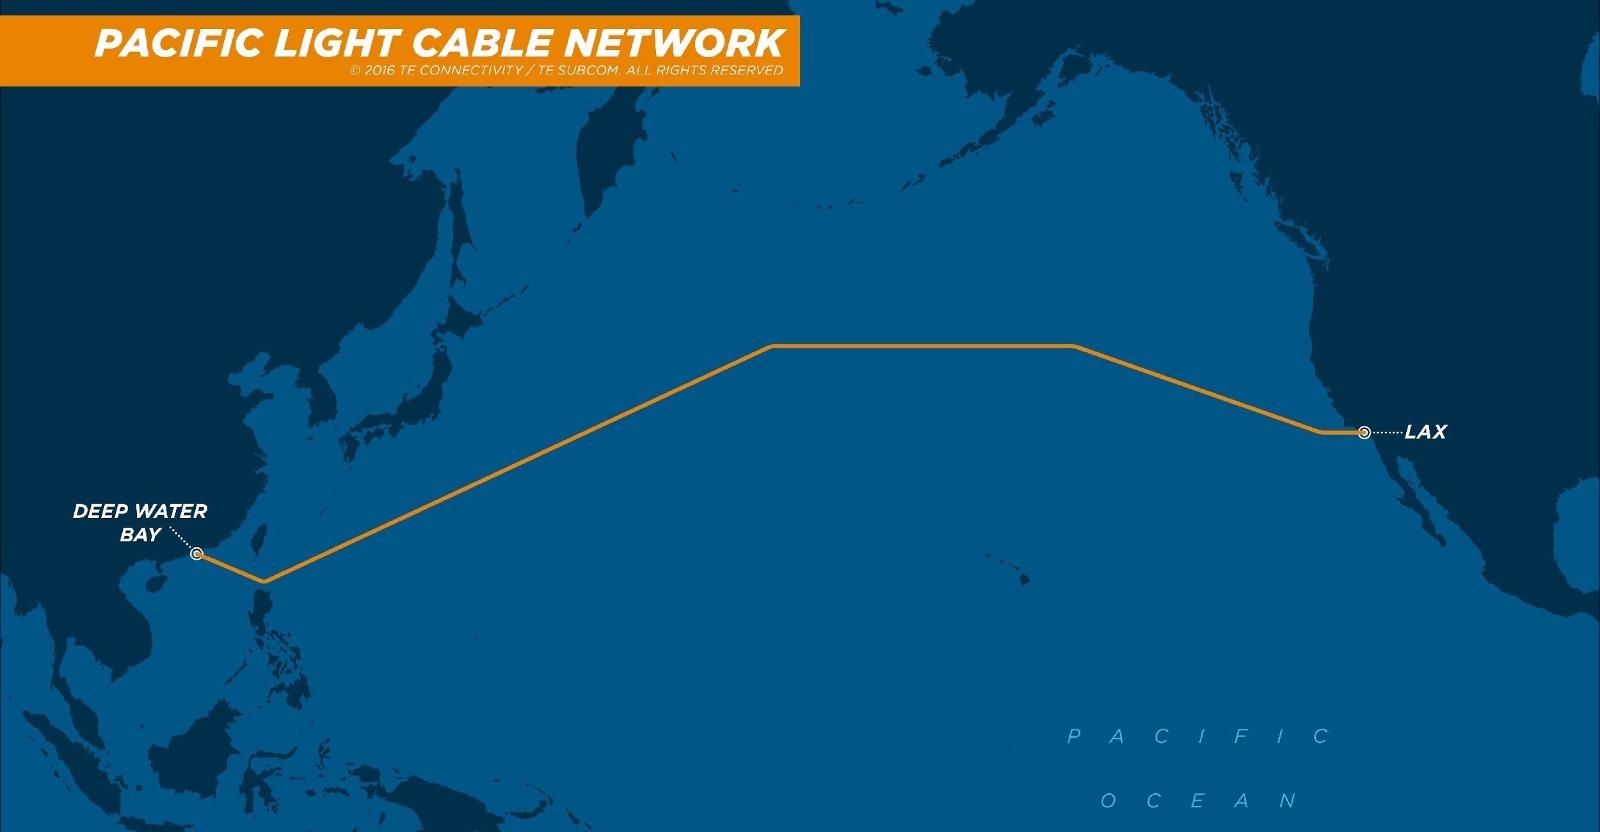 PLCN Cable System